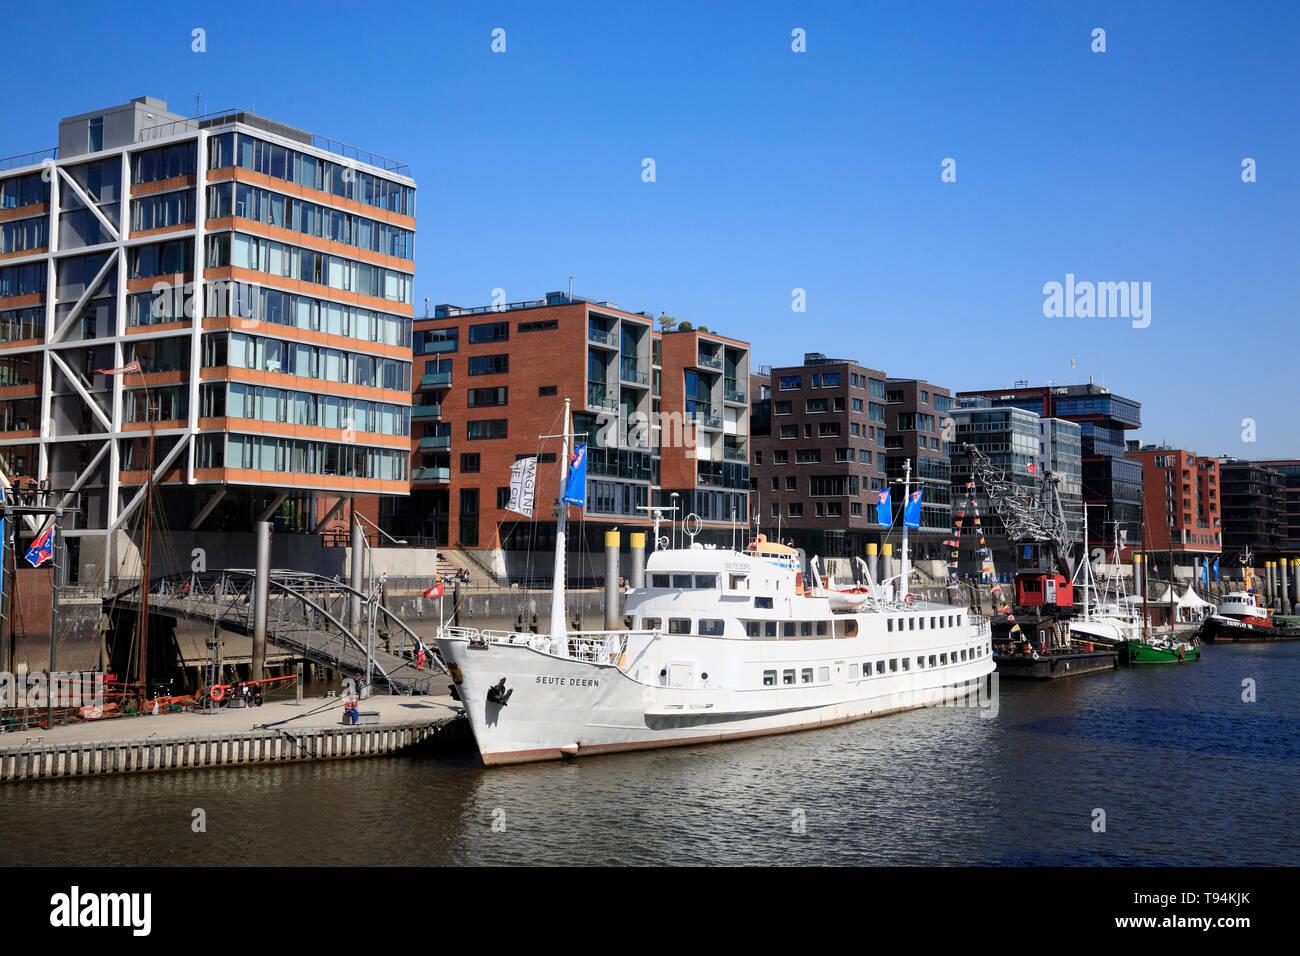 Sandtorharbour, histoprical ships,  Hamburg, Germany, Europe Stock Photo